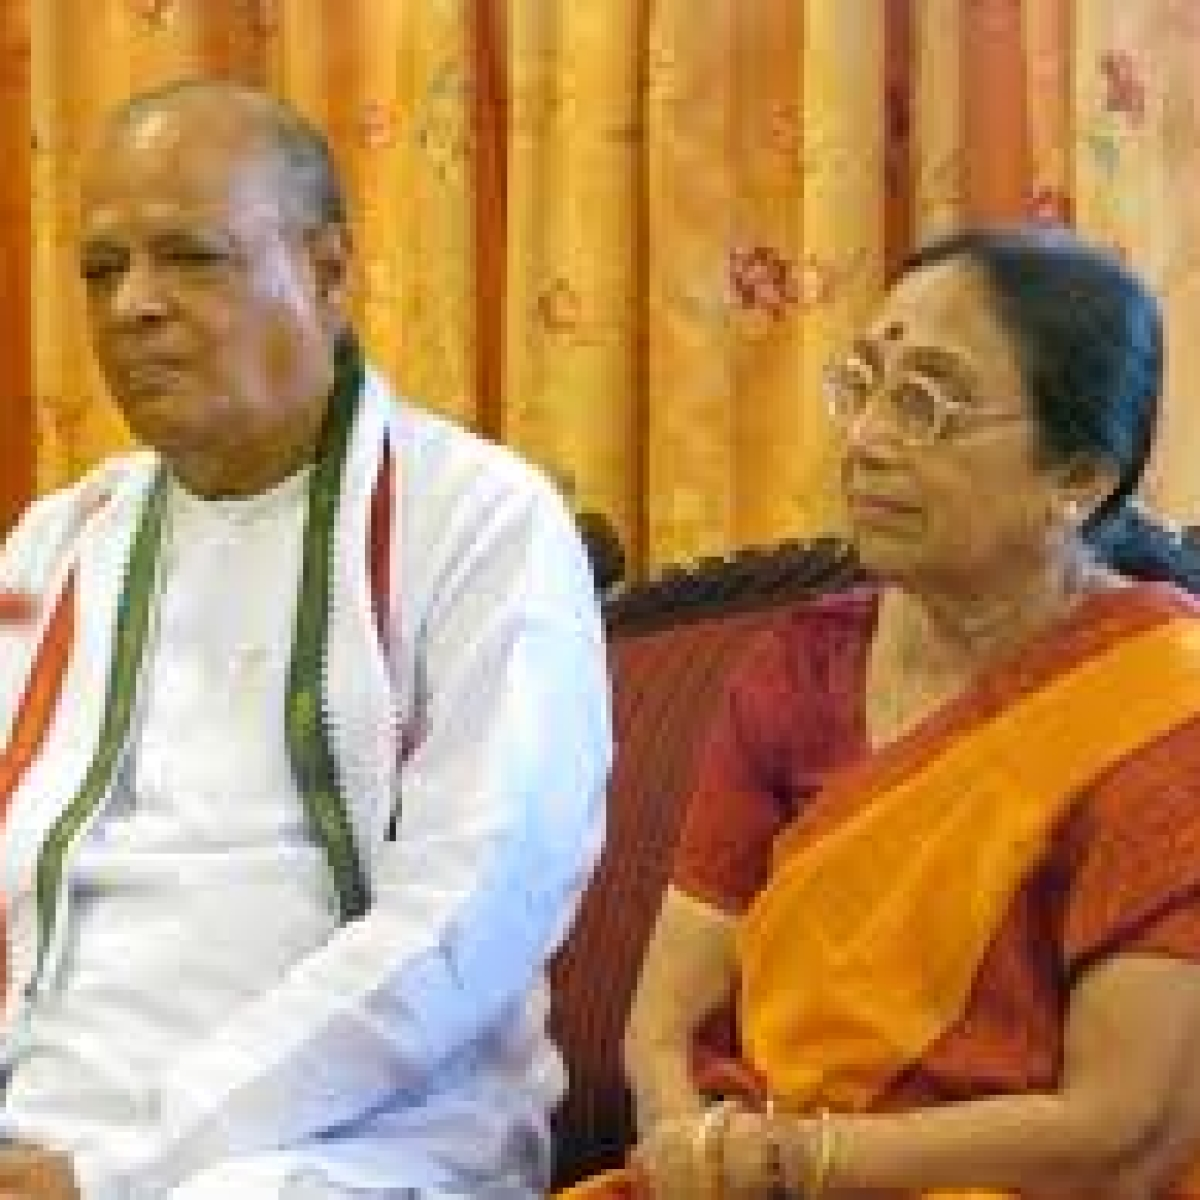 This day 25 years ago:  The Orissa Verdict